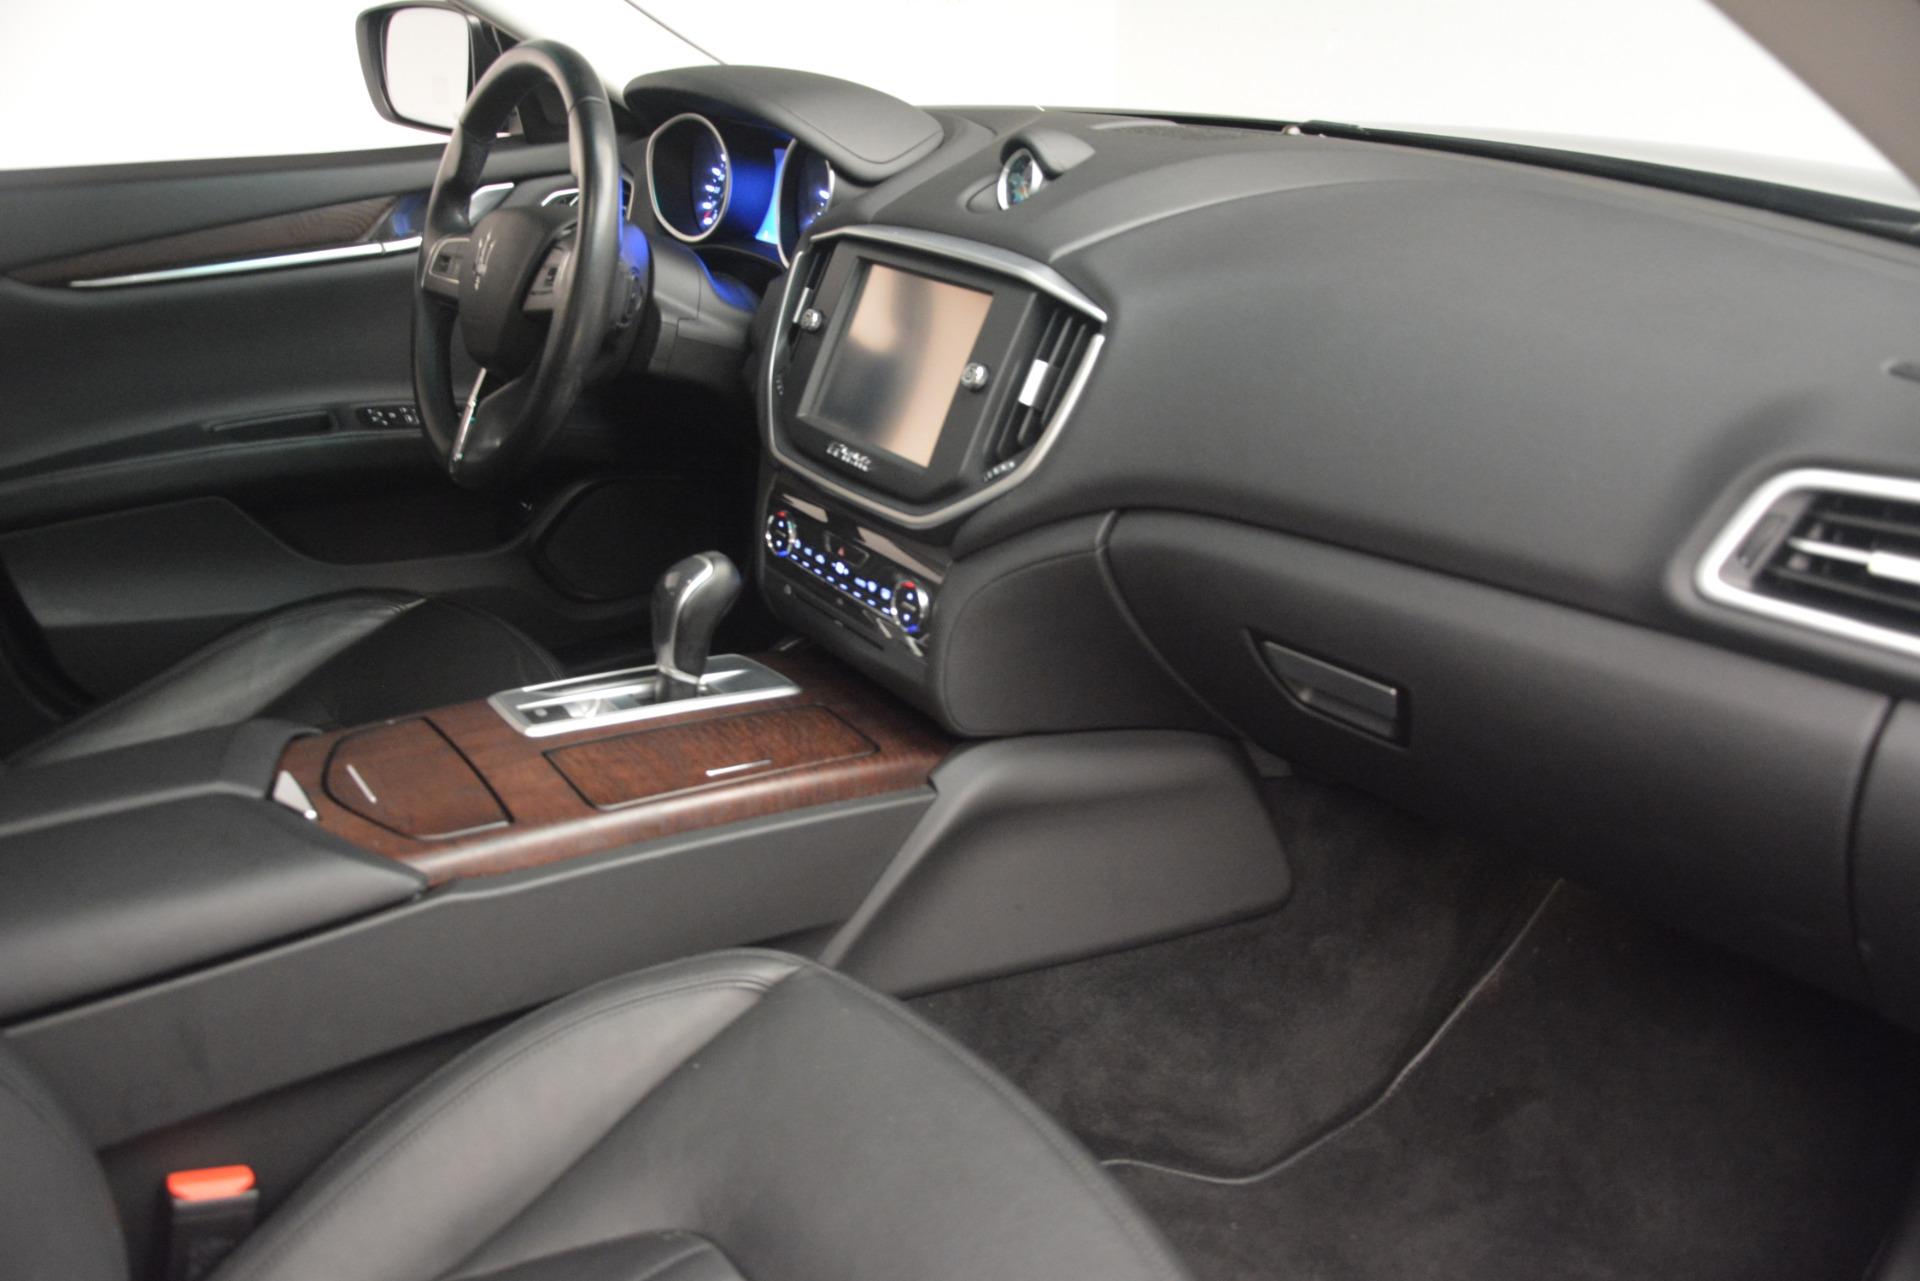 Used 2015 Maserati Ghibli S Q4 For Sale In Greenwich, CT. Alfa Romeo of Greenwich, 7536 3102_p18